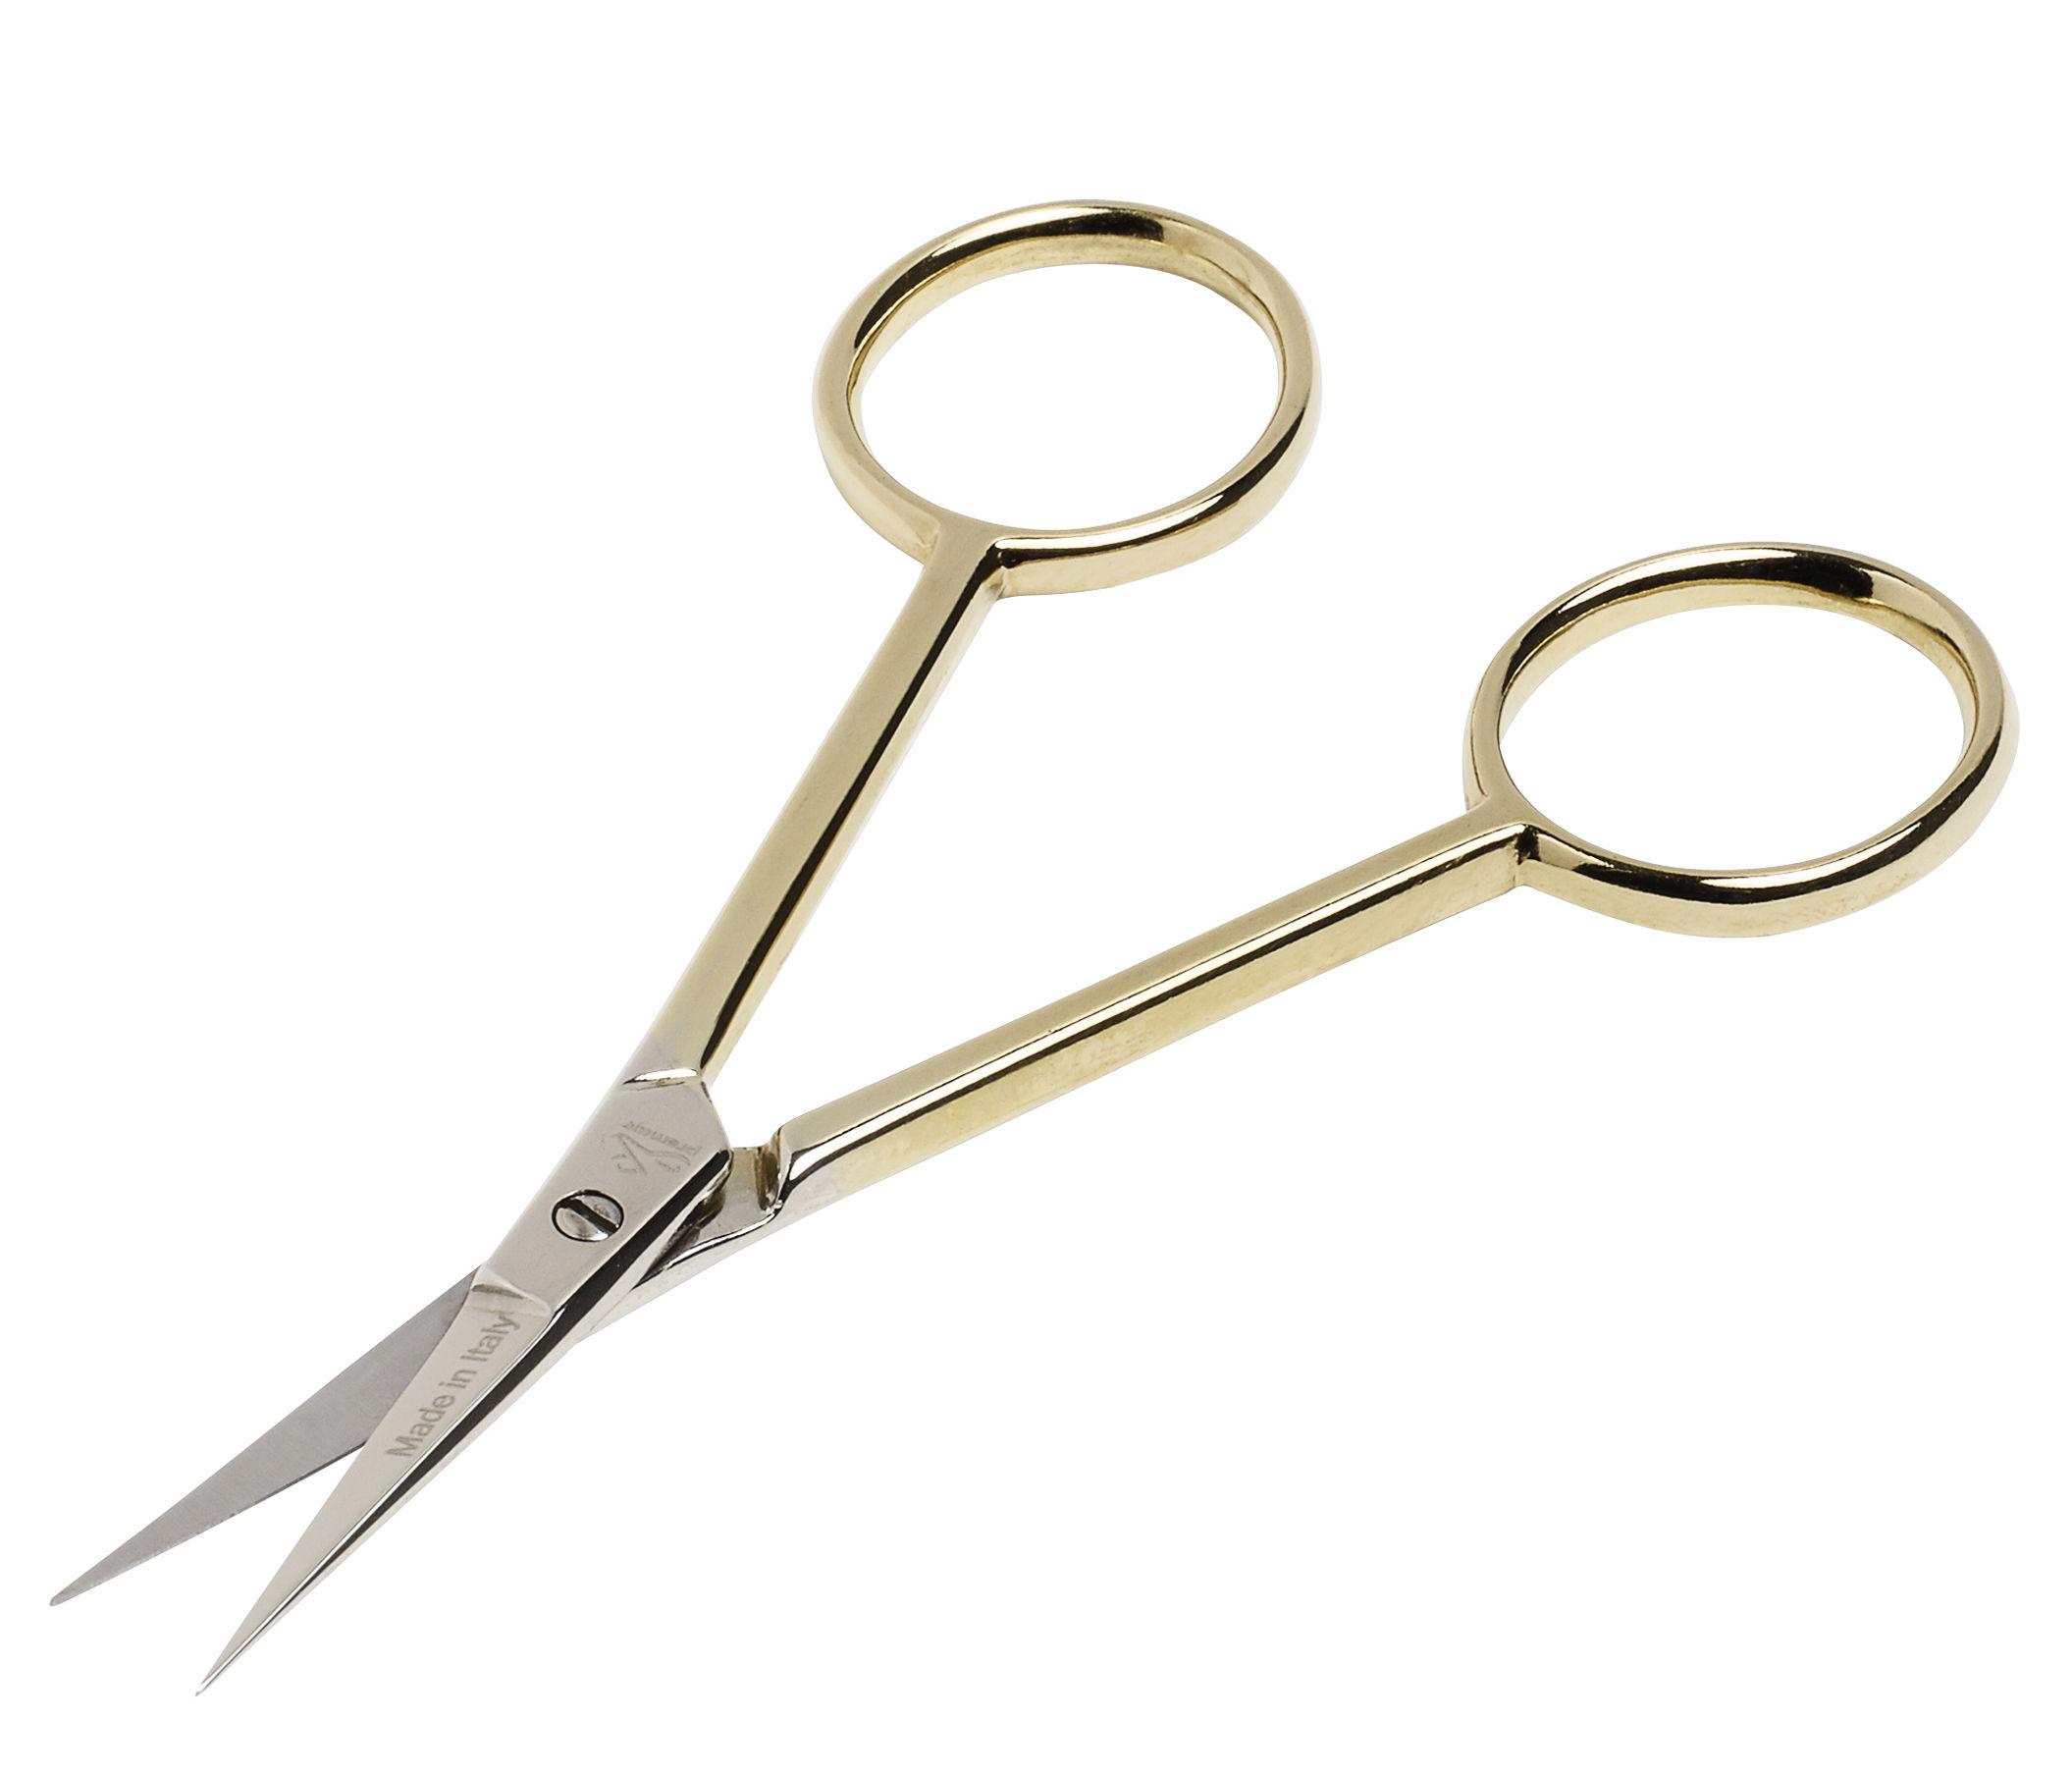 Accessories - Desk & Office Accessories - Delicate Scissors Scissors - L 10,5 cm by Hay - Gold - Steel